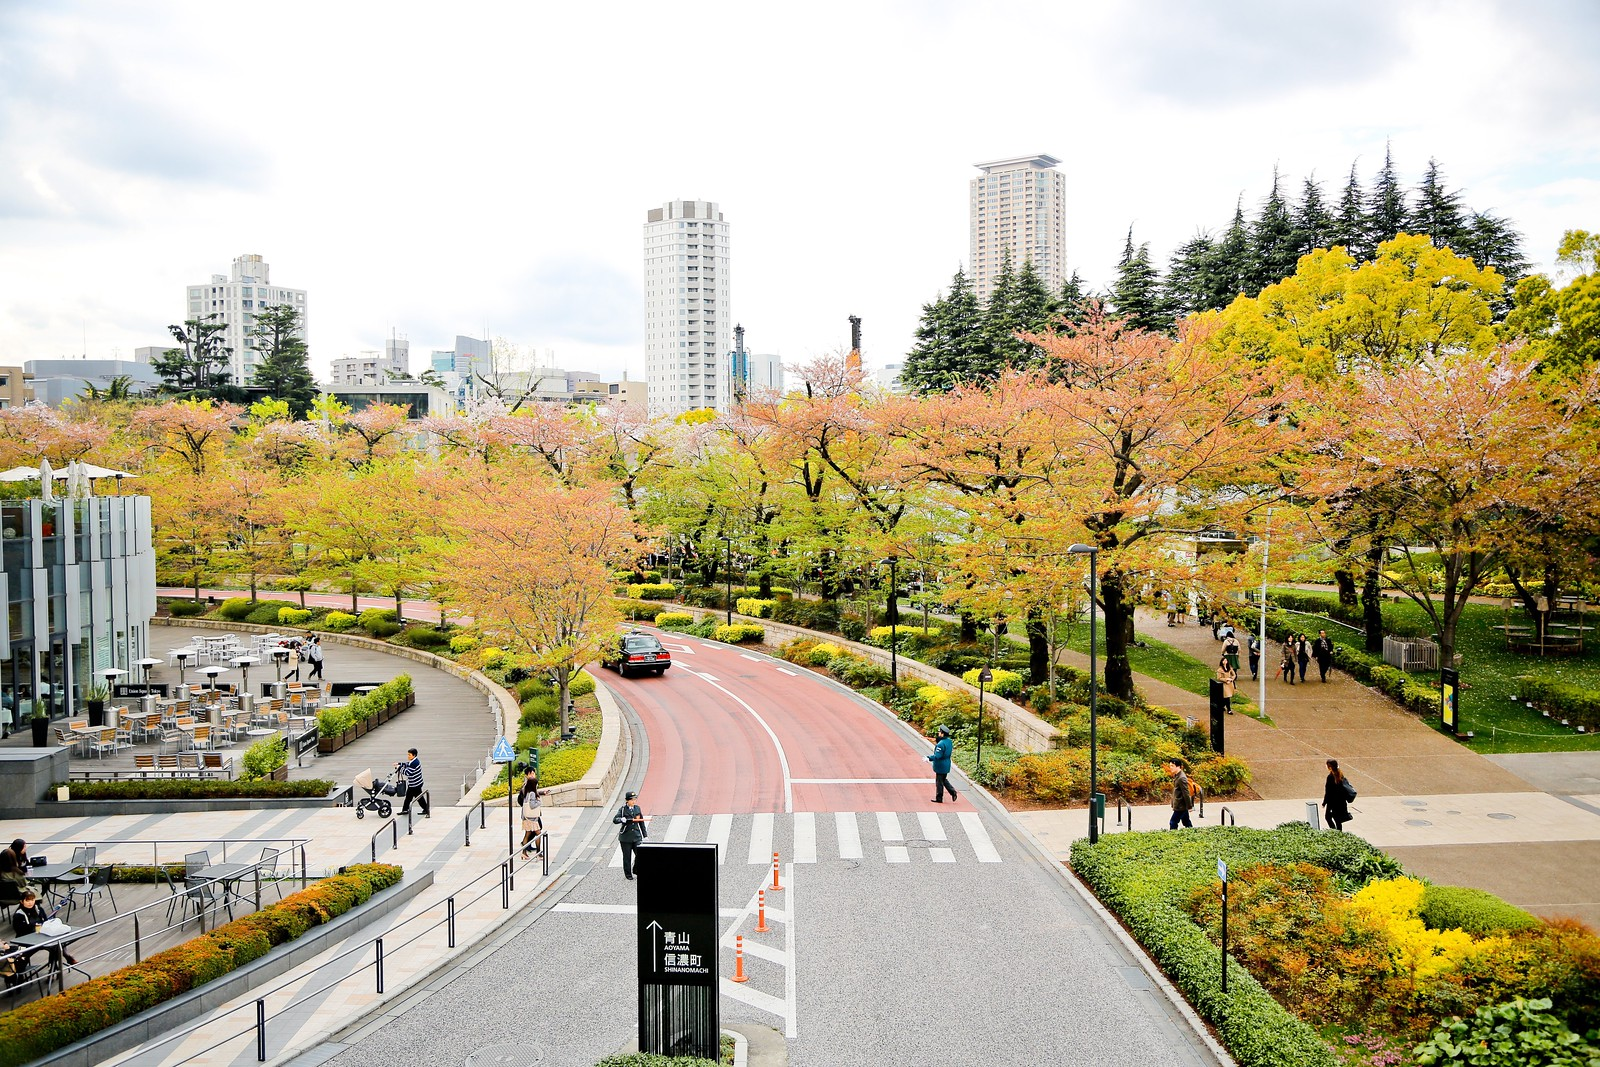 六本木 Tokyo Midtown 檜町公園